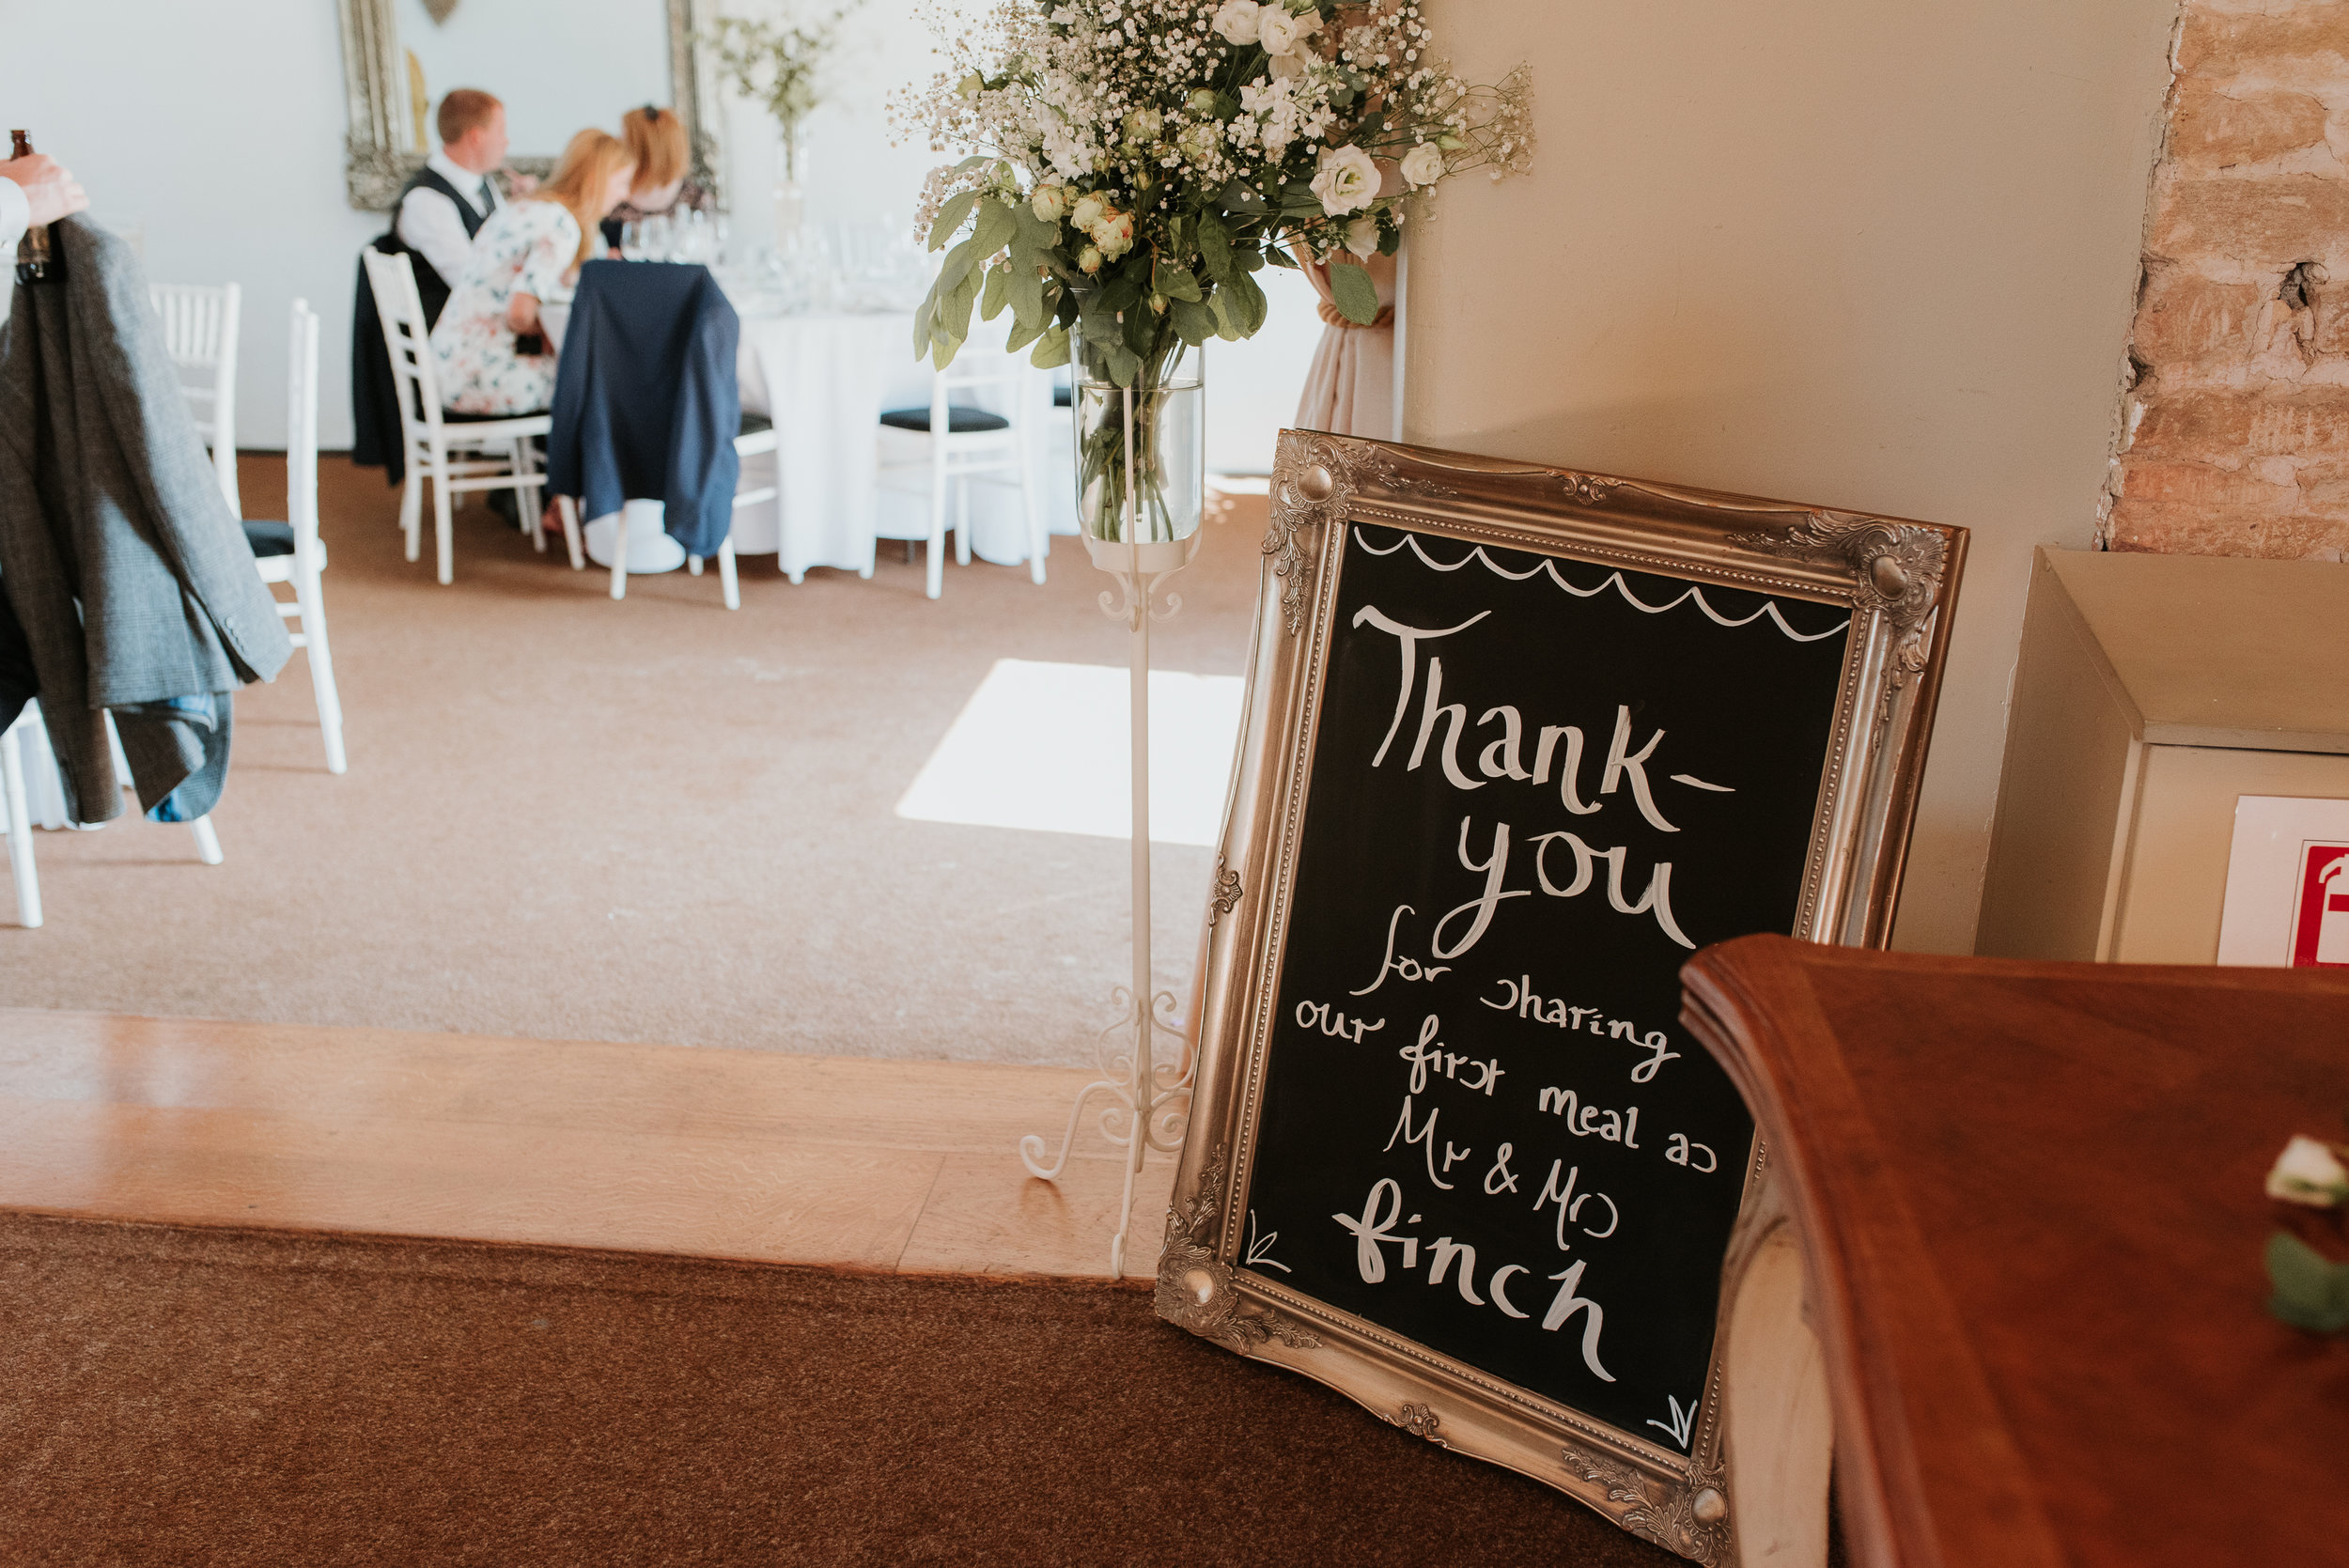 Oxfordshire-wedding-photographer-60.jpg